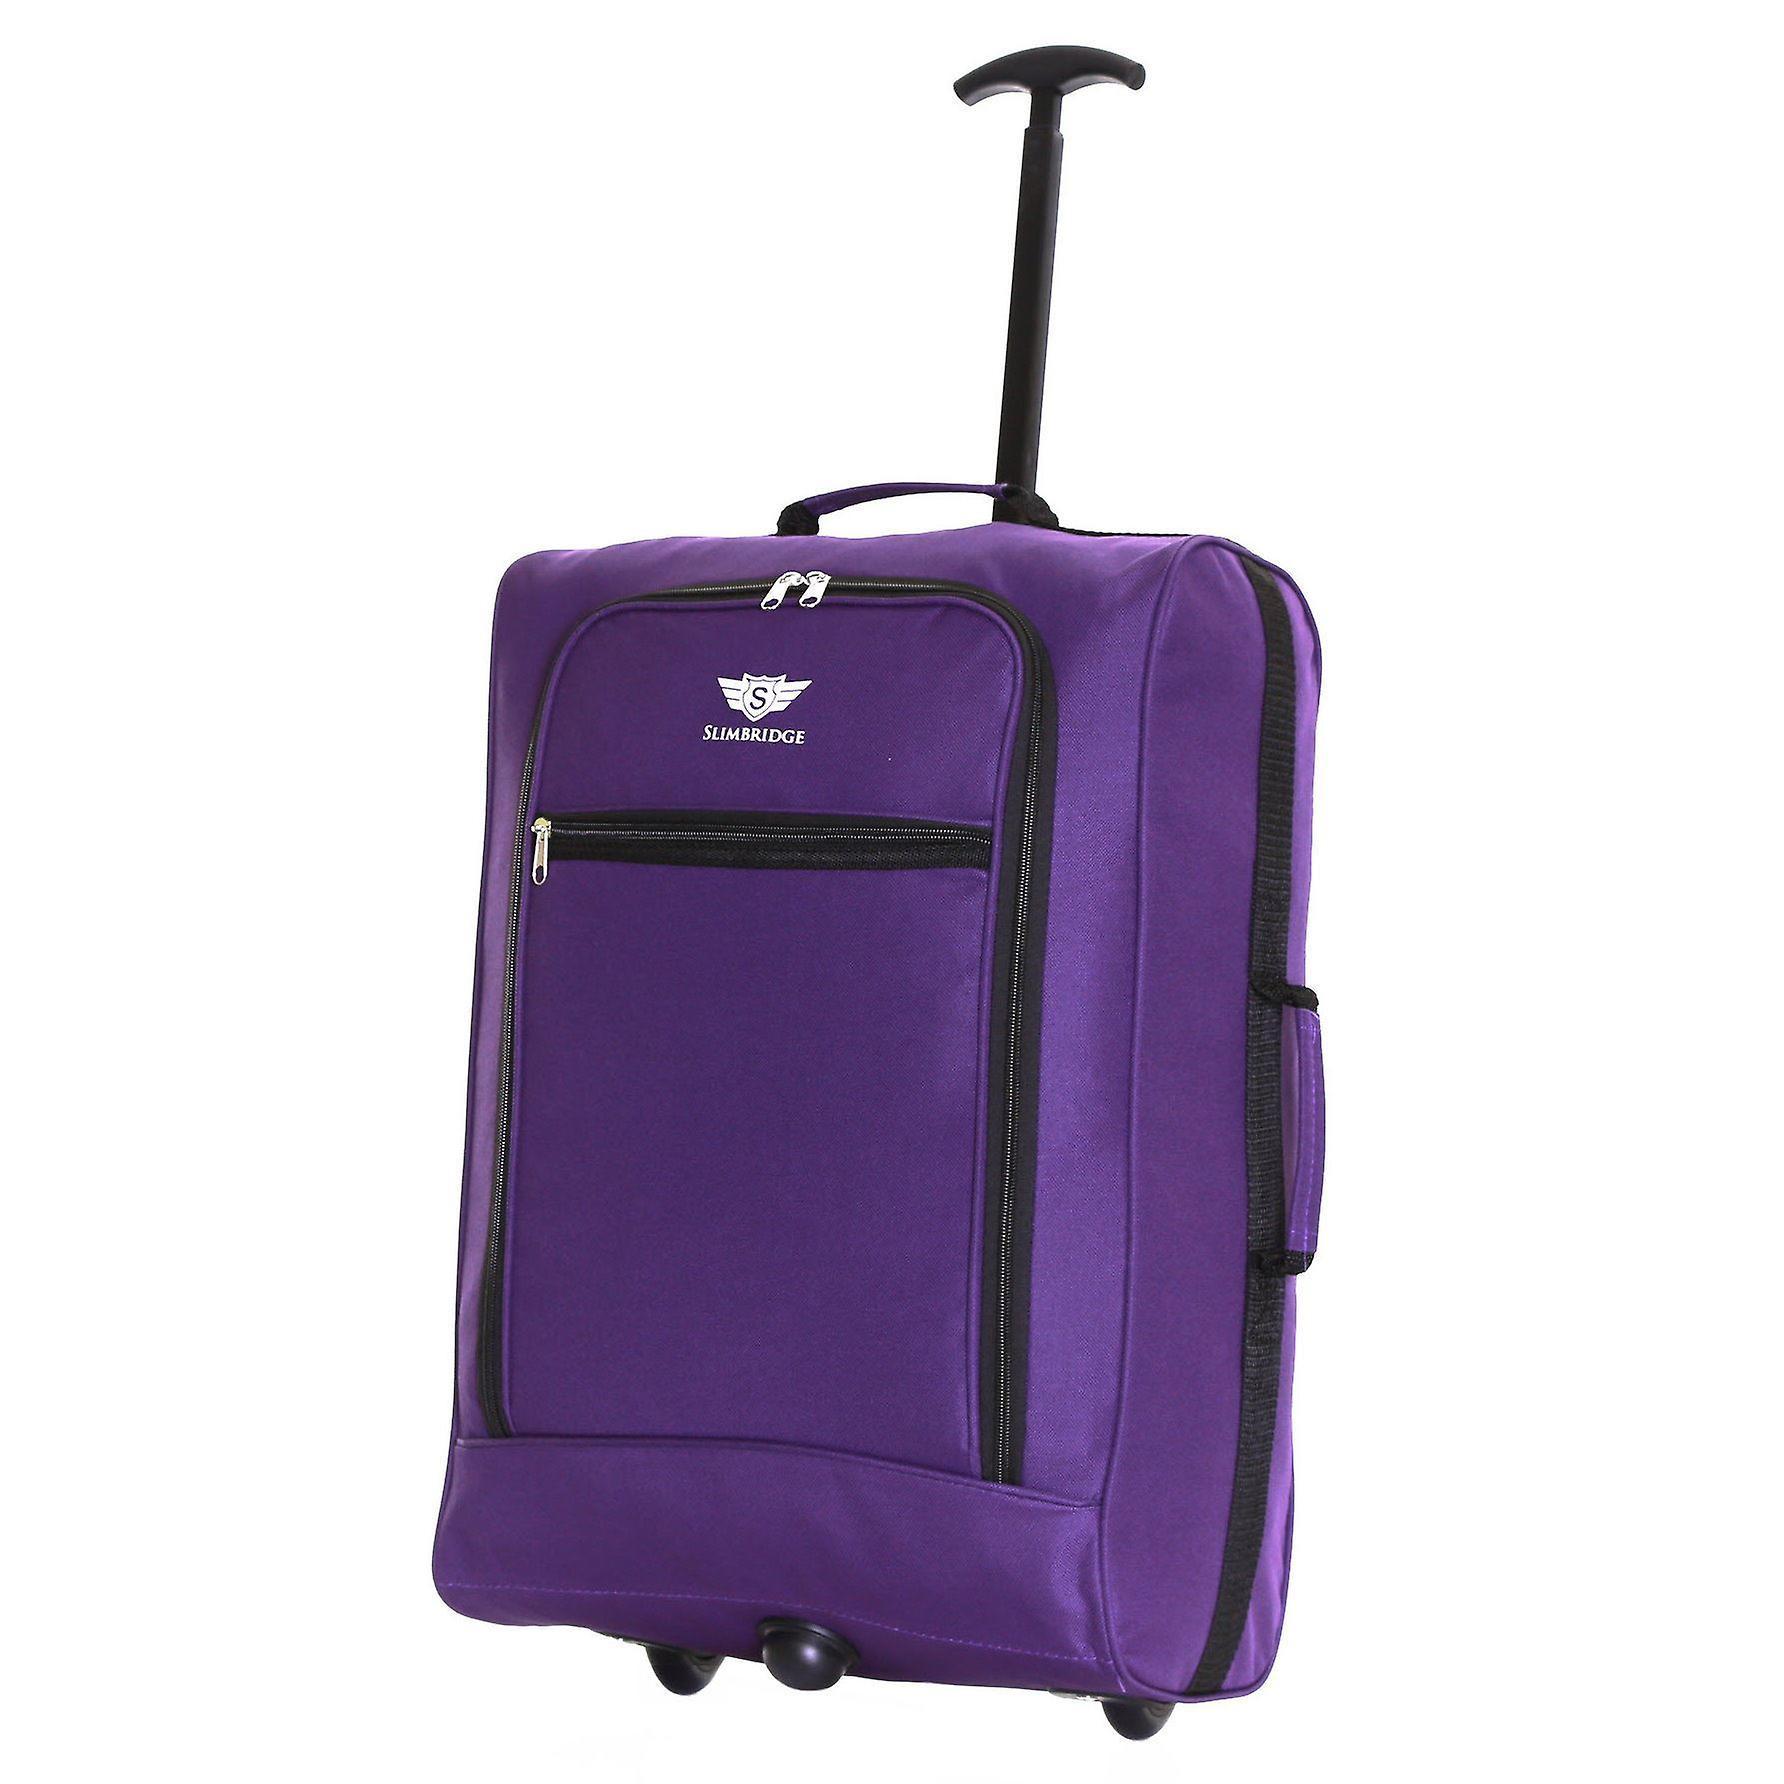 Slimbridge Montecorto Set of 2 Cabin Luggage Bags, Purple (SET OF 2)